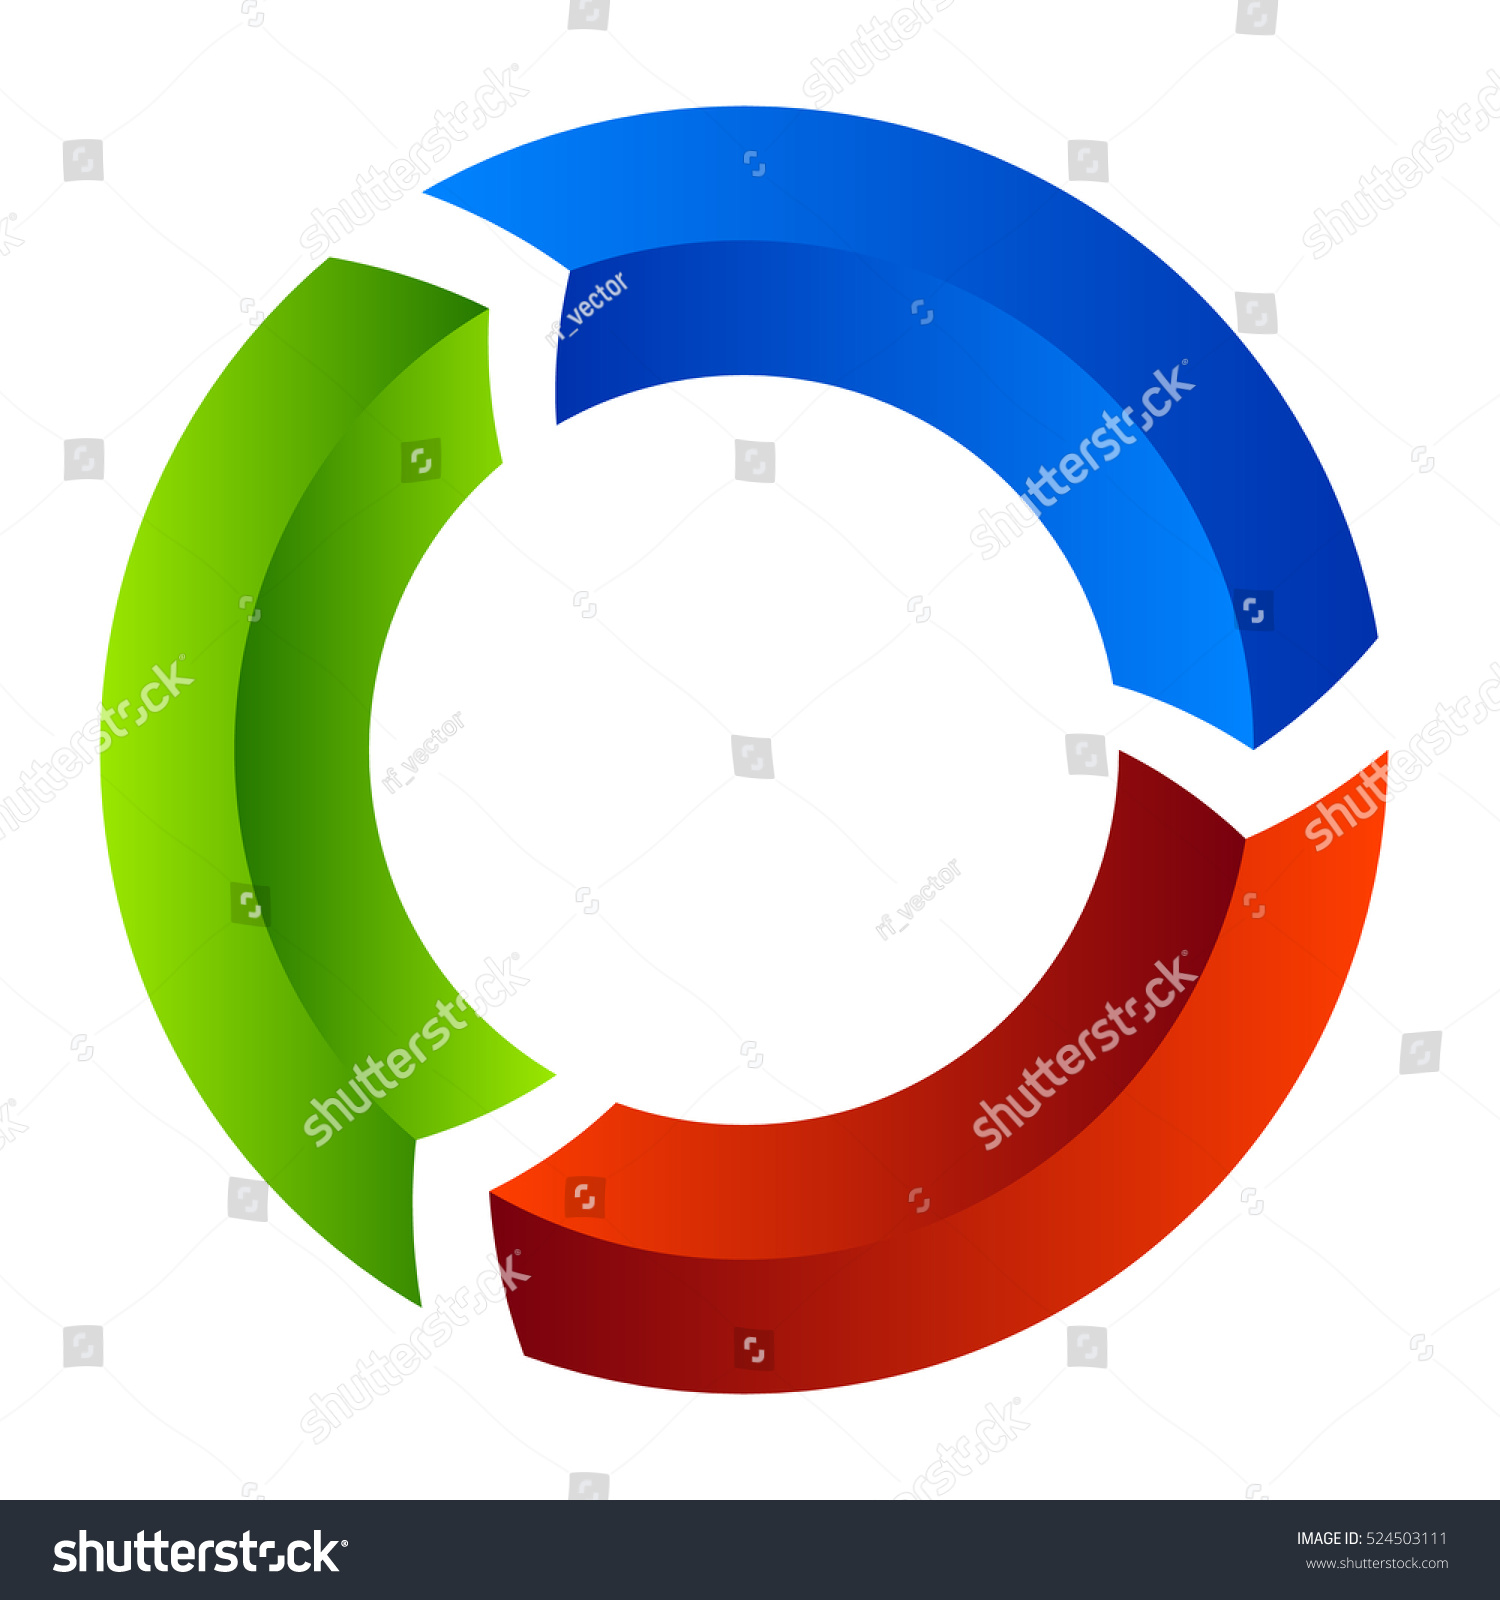 Process cycling arrow by arrow royalty free stock images image - Segmented Circle Arrow Circular Arrow Icon Process Progres Rotation Icon